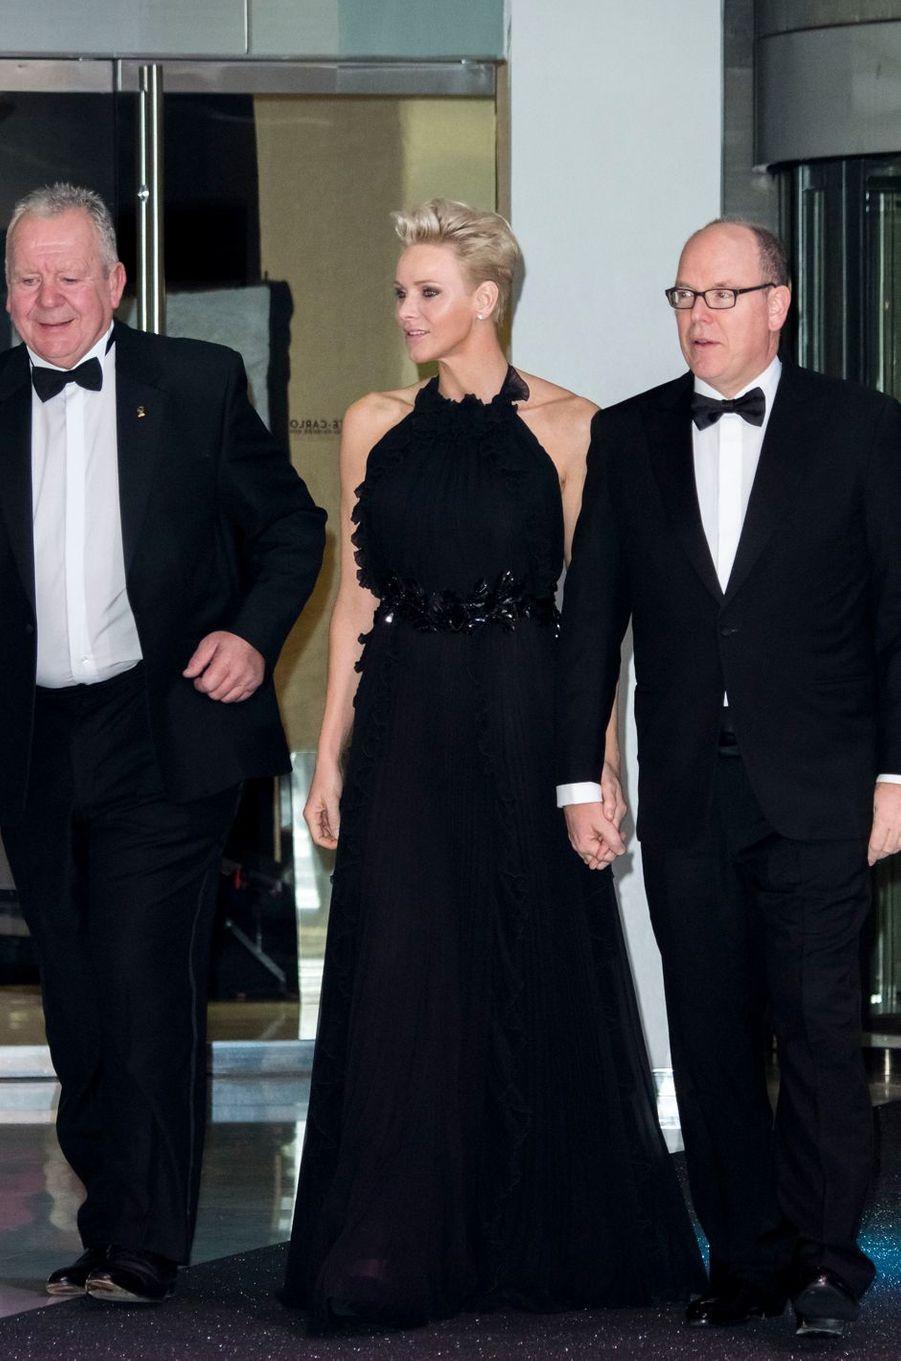 La princesse Charlène, dans une robe Gucci, et le prince Albert II de Monaco à Monaco, le 26 novembre 2017